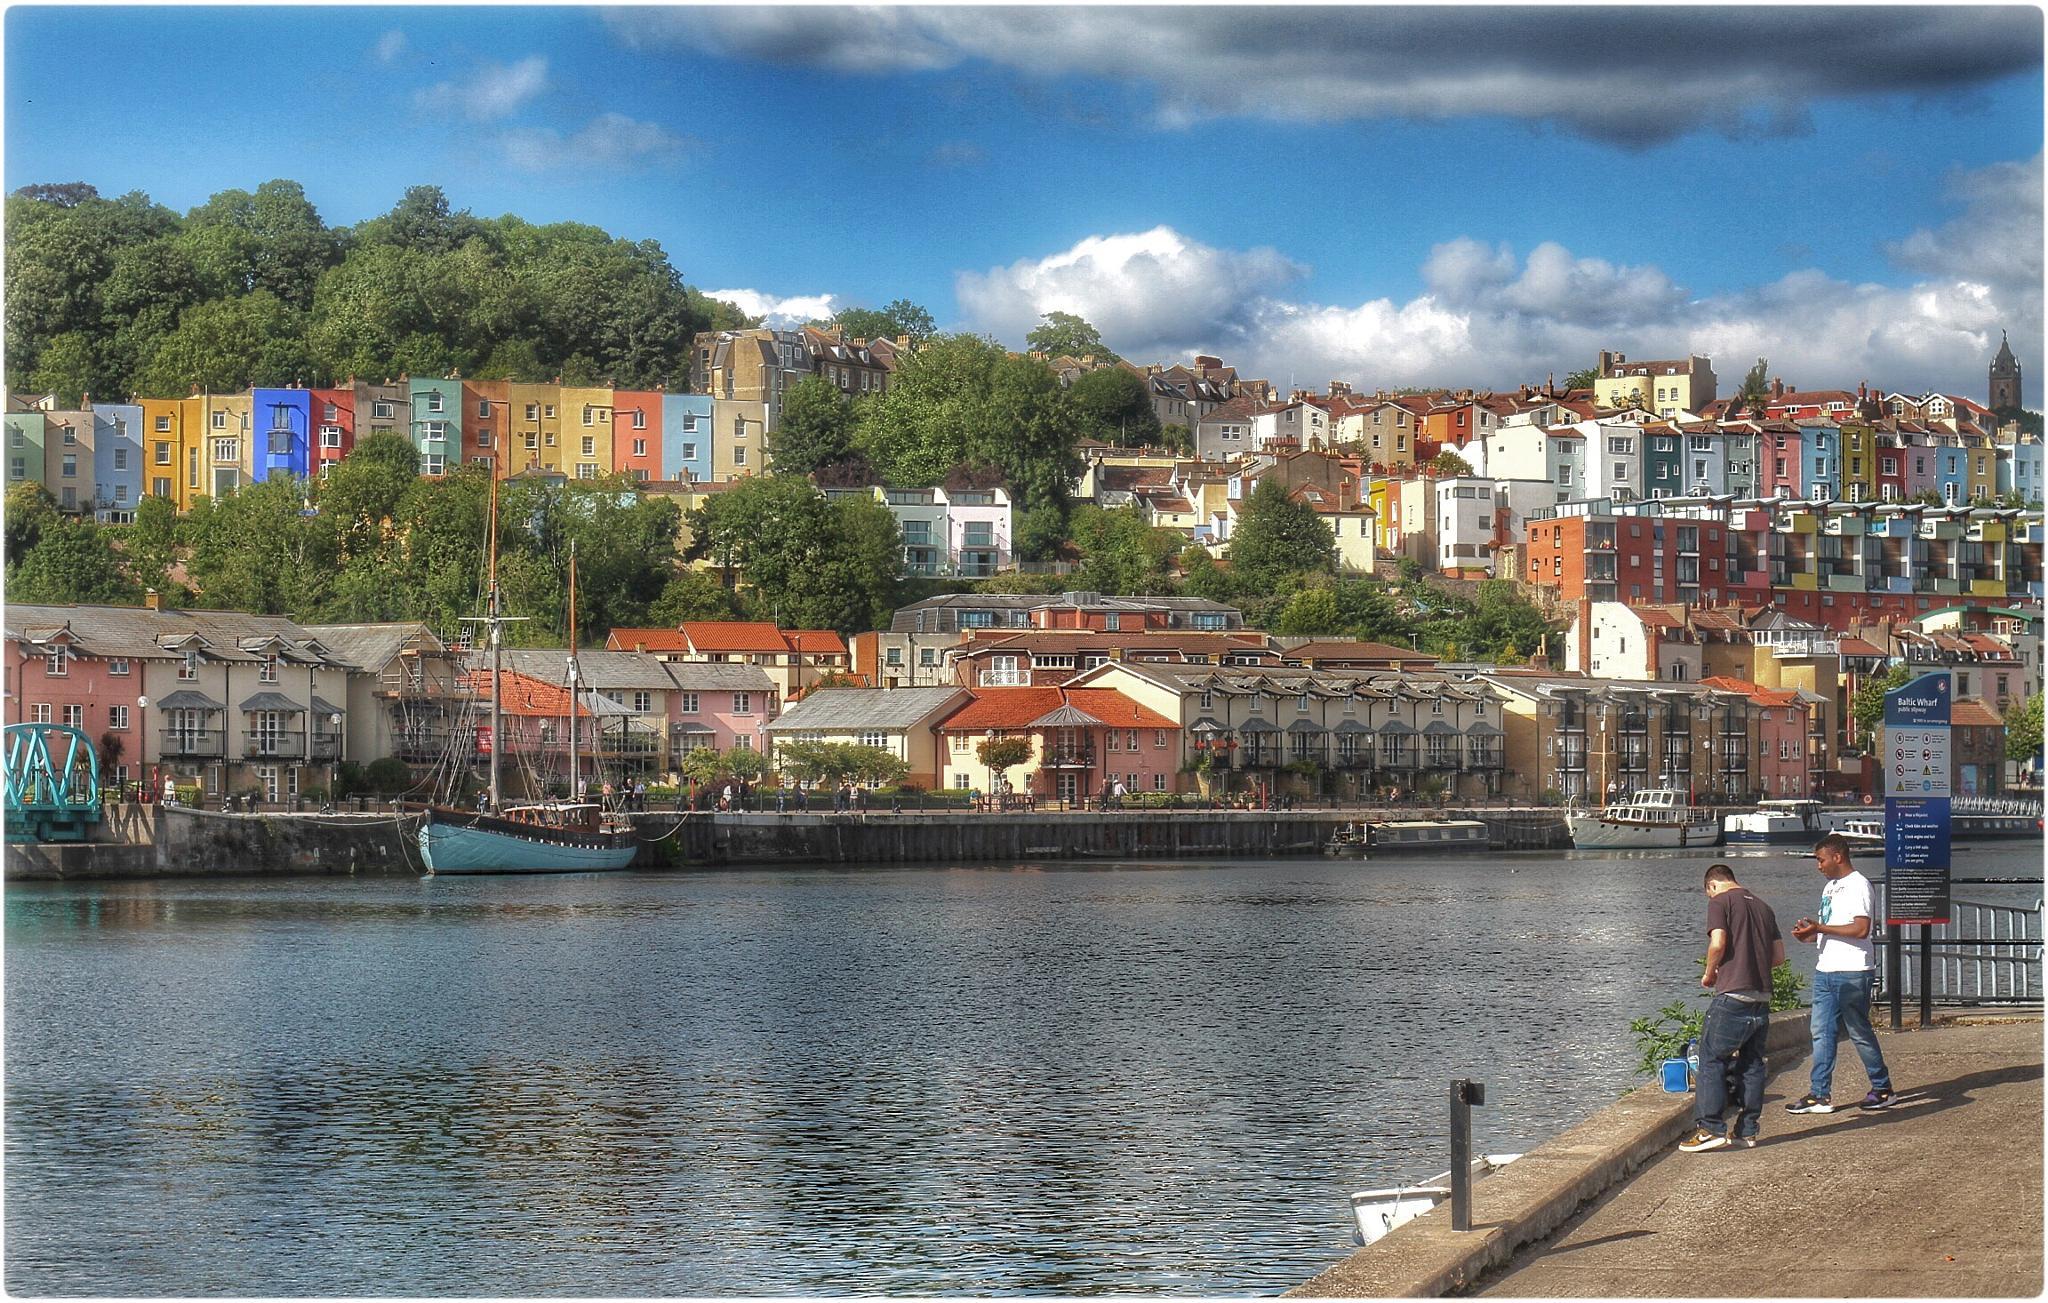 Bristol harbourside by John John McLane Freelance photographer